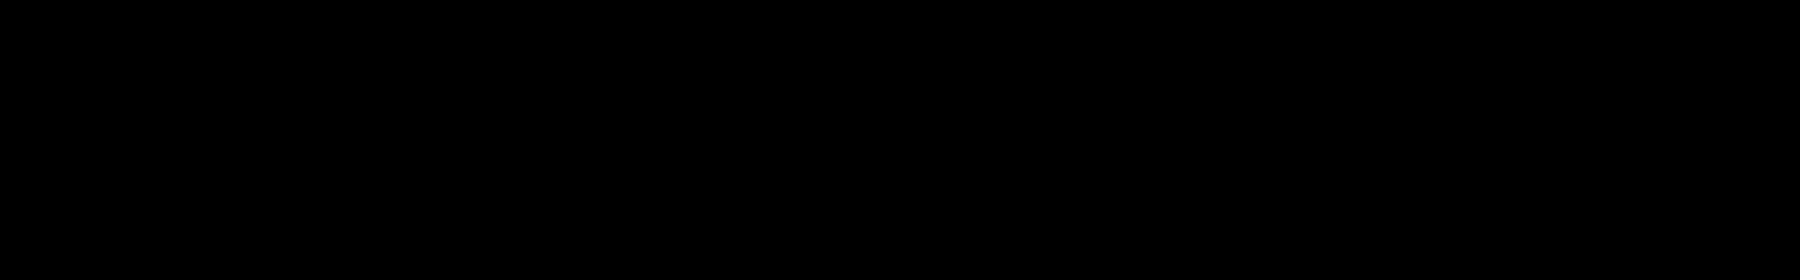 Riddim audio waveform